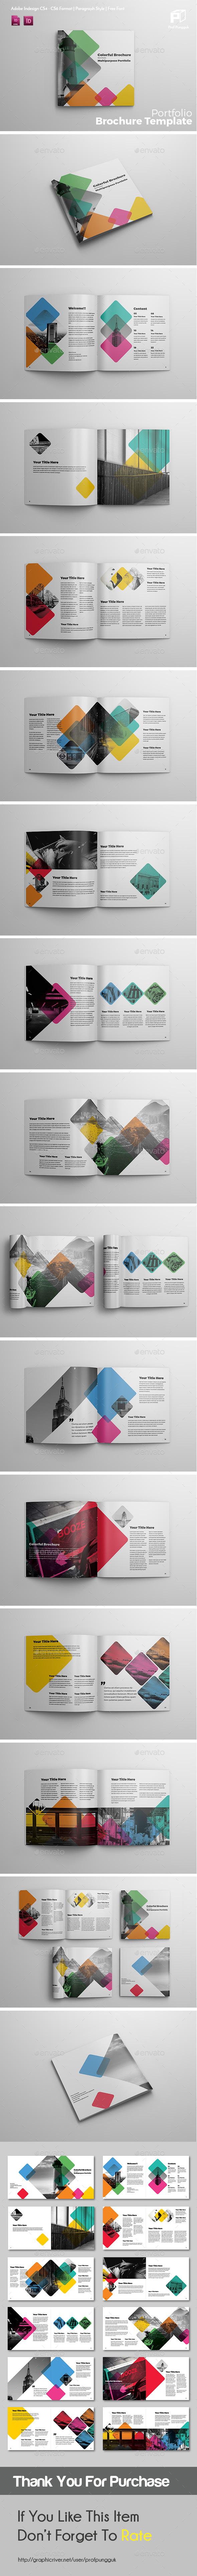 Square Brochure Vol.4 - Portfolio Brochures